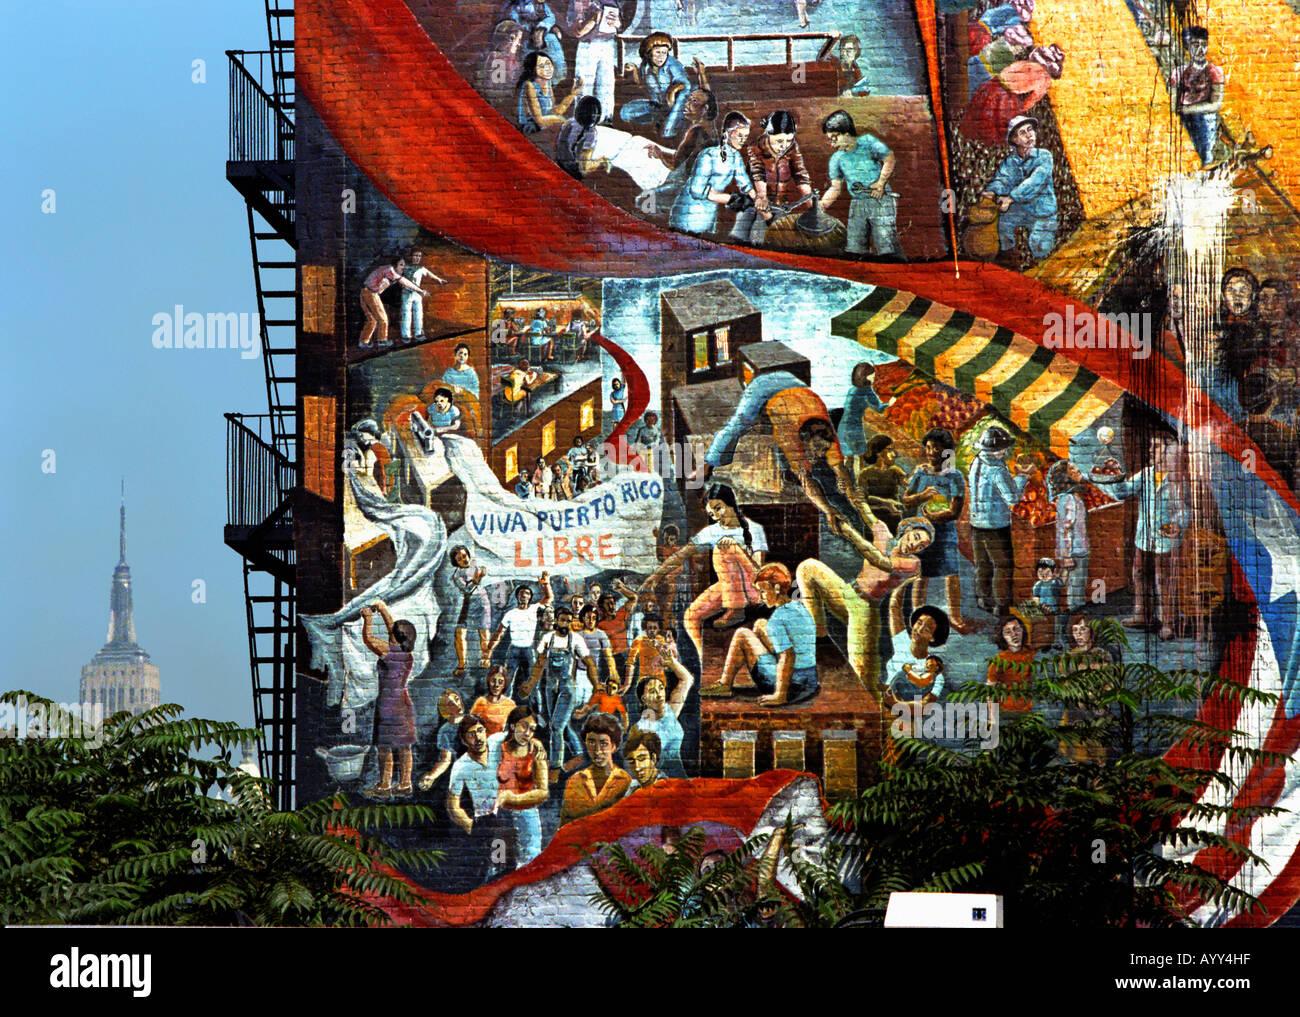 Peinture sur mur Manhattan USA Libre Porto Rico Photo Stock